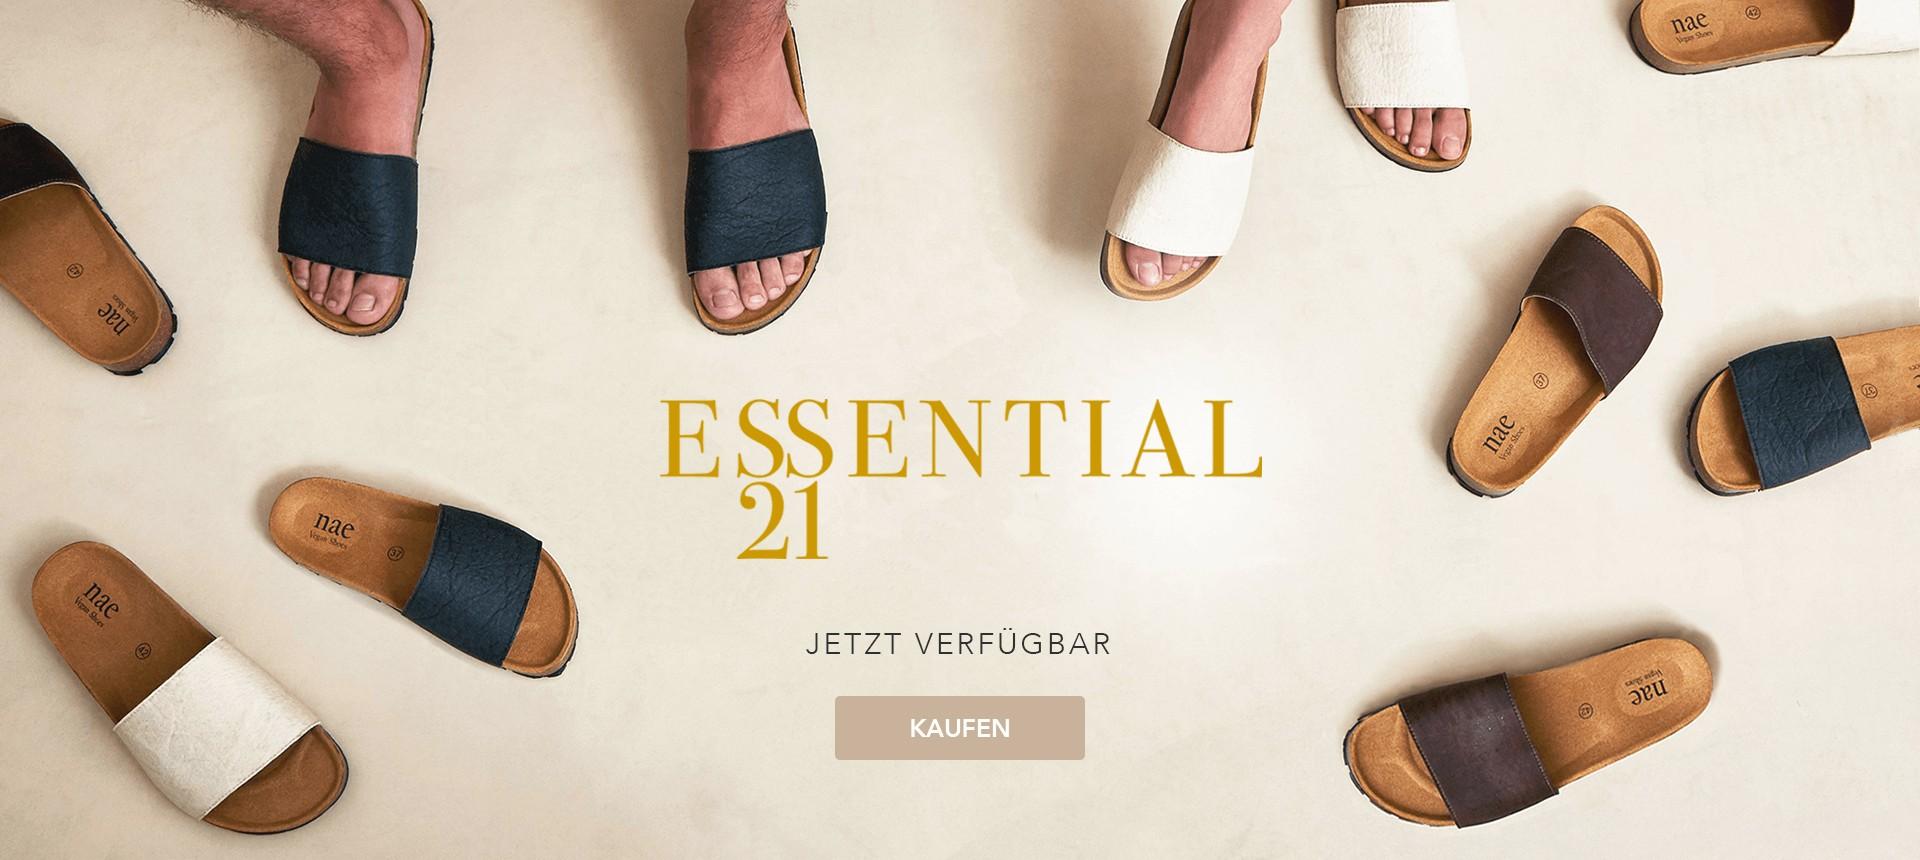 Vegane Schuhe - Neue Frühjahr / Sommer-Kollektion_1